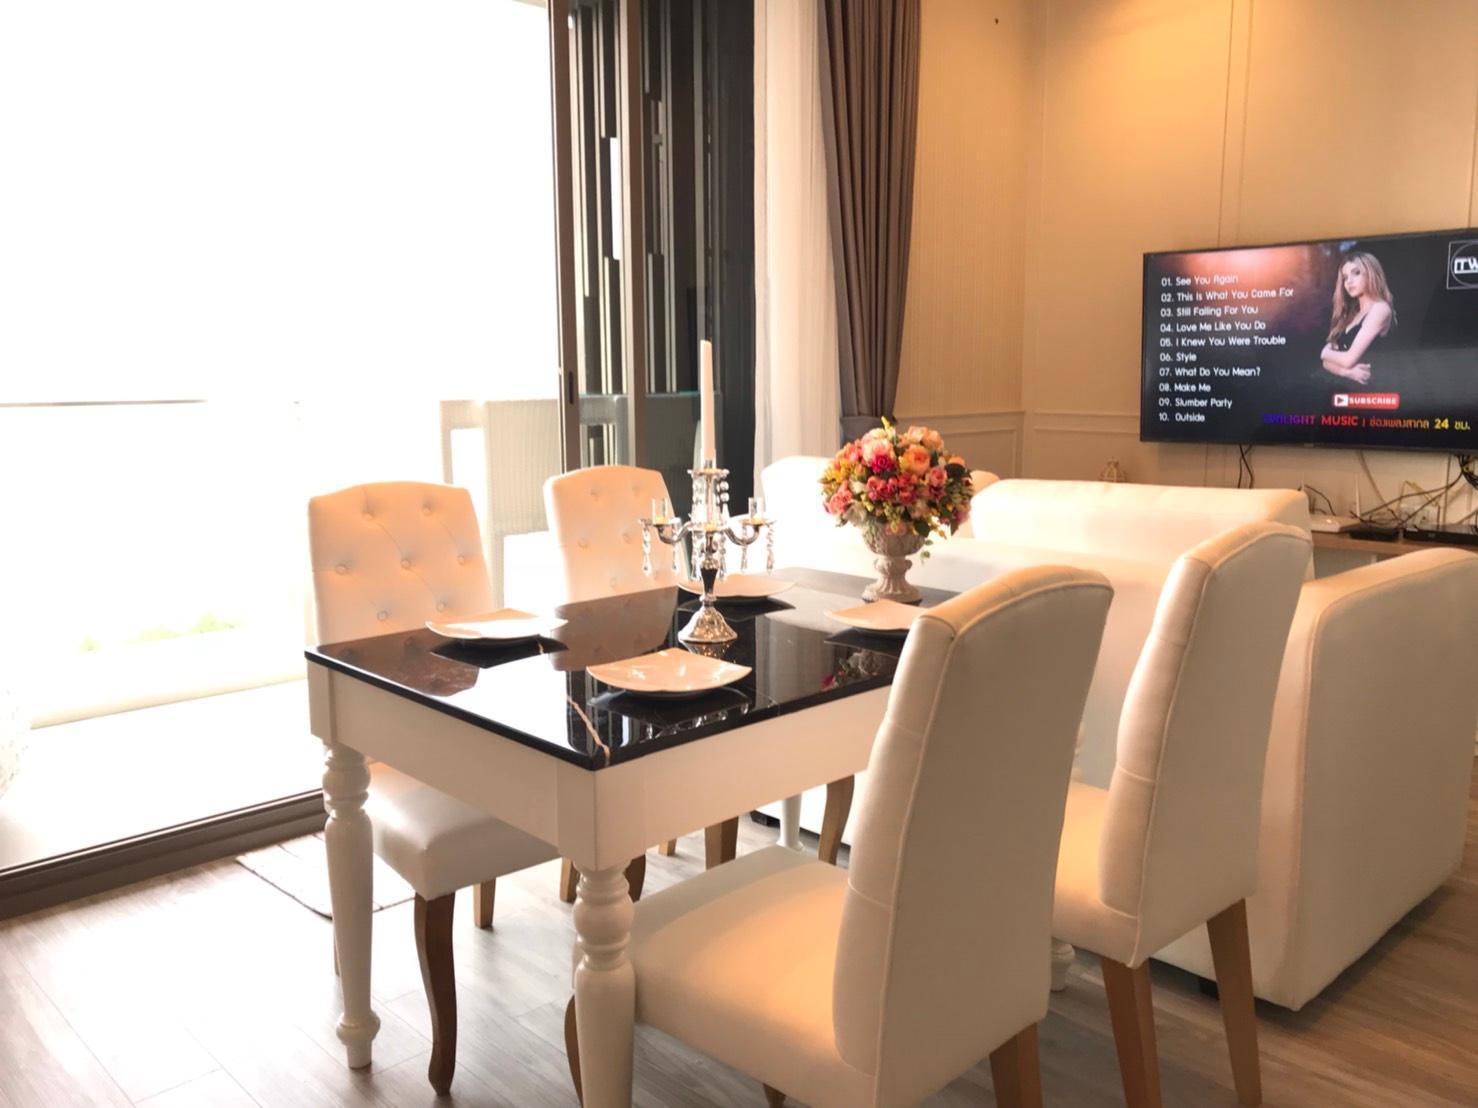 Baan Plai Haad Pattaya , Beachside Room,อพาร์ตเมนต์ 2 ห้องนอน 2 ห้องน้ำส่วนตัว ขนาด 80 ตร.ม. – นาเกลือ/บางละมุง